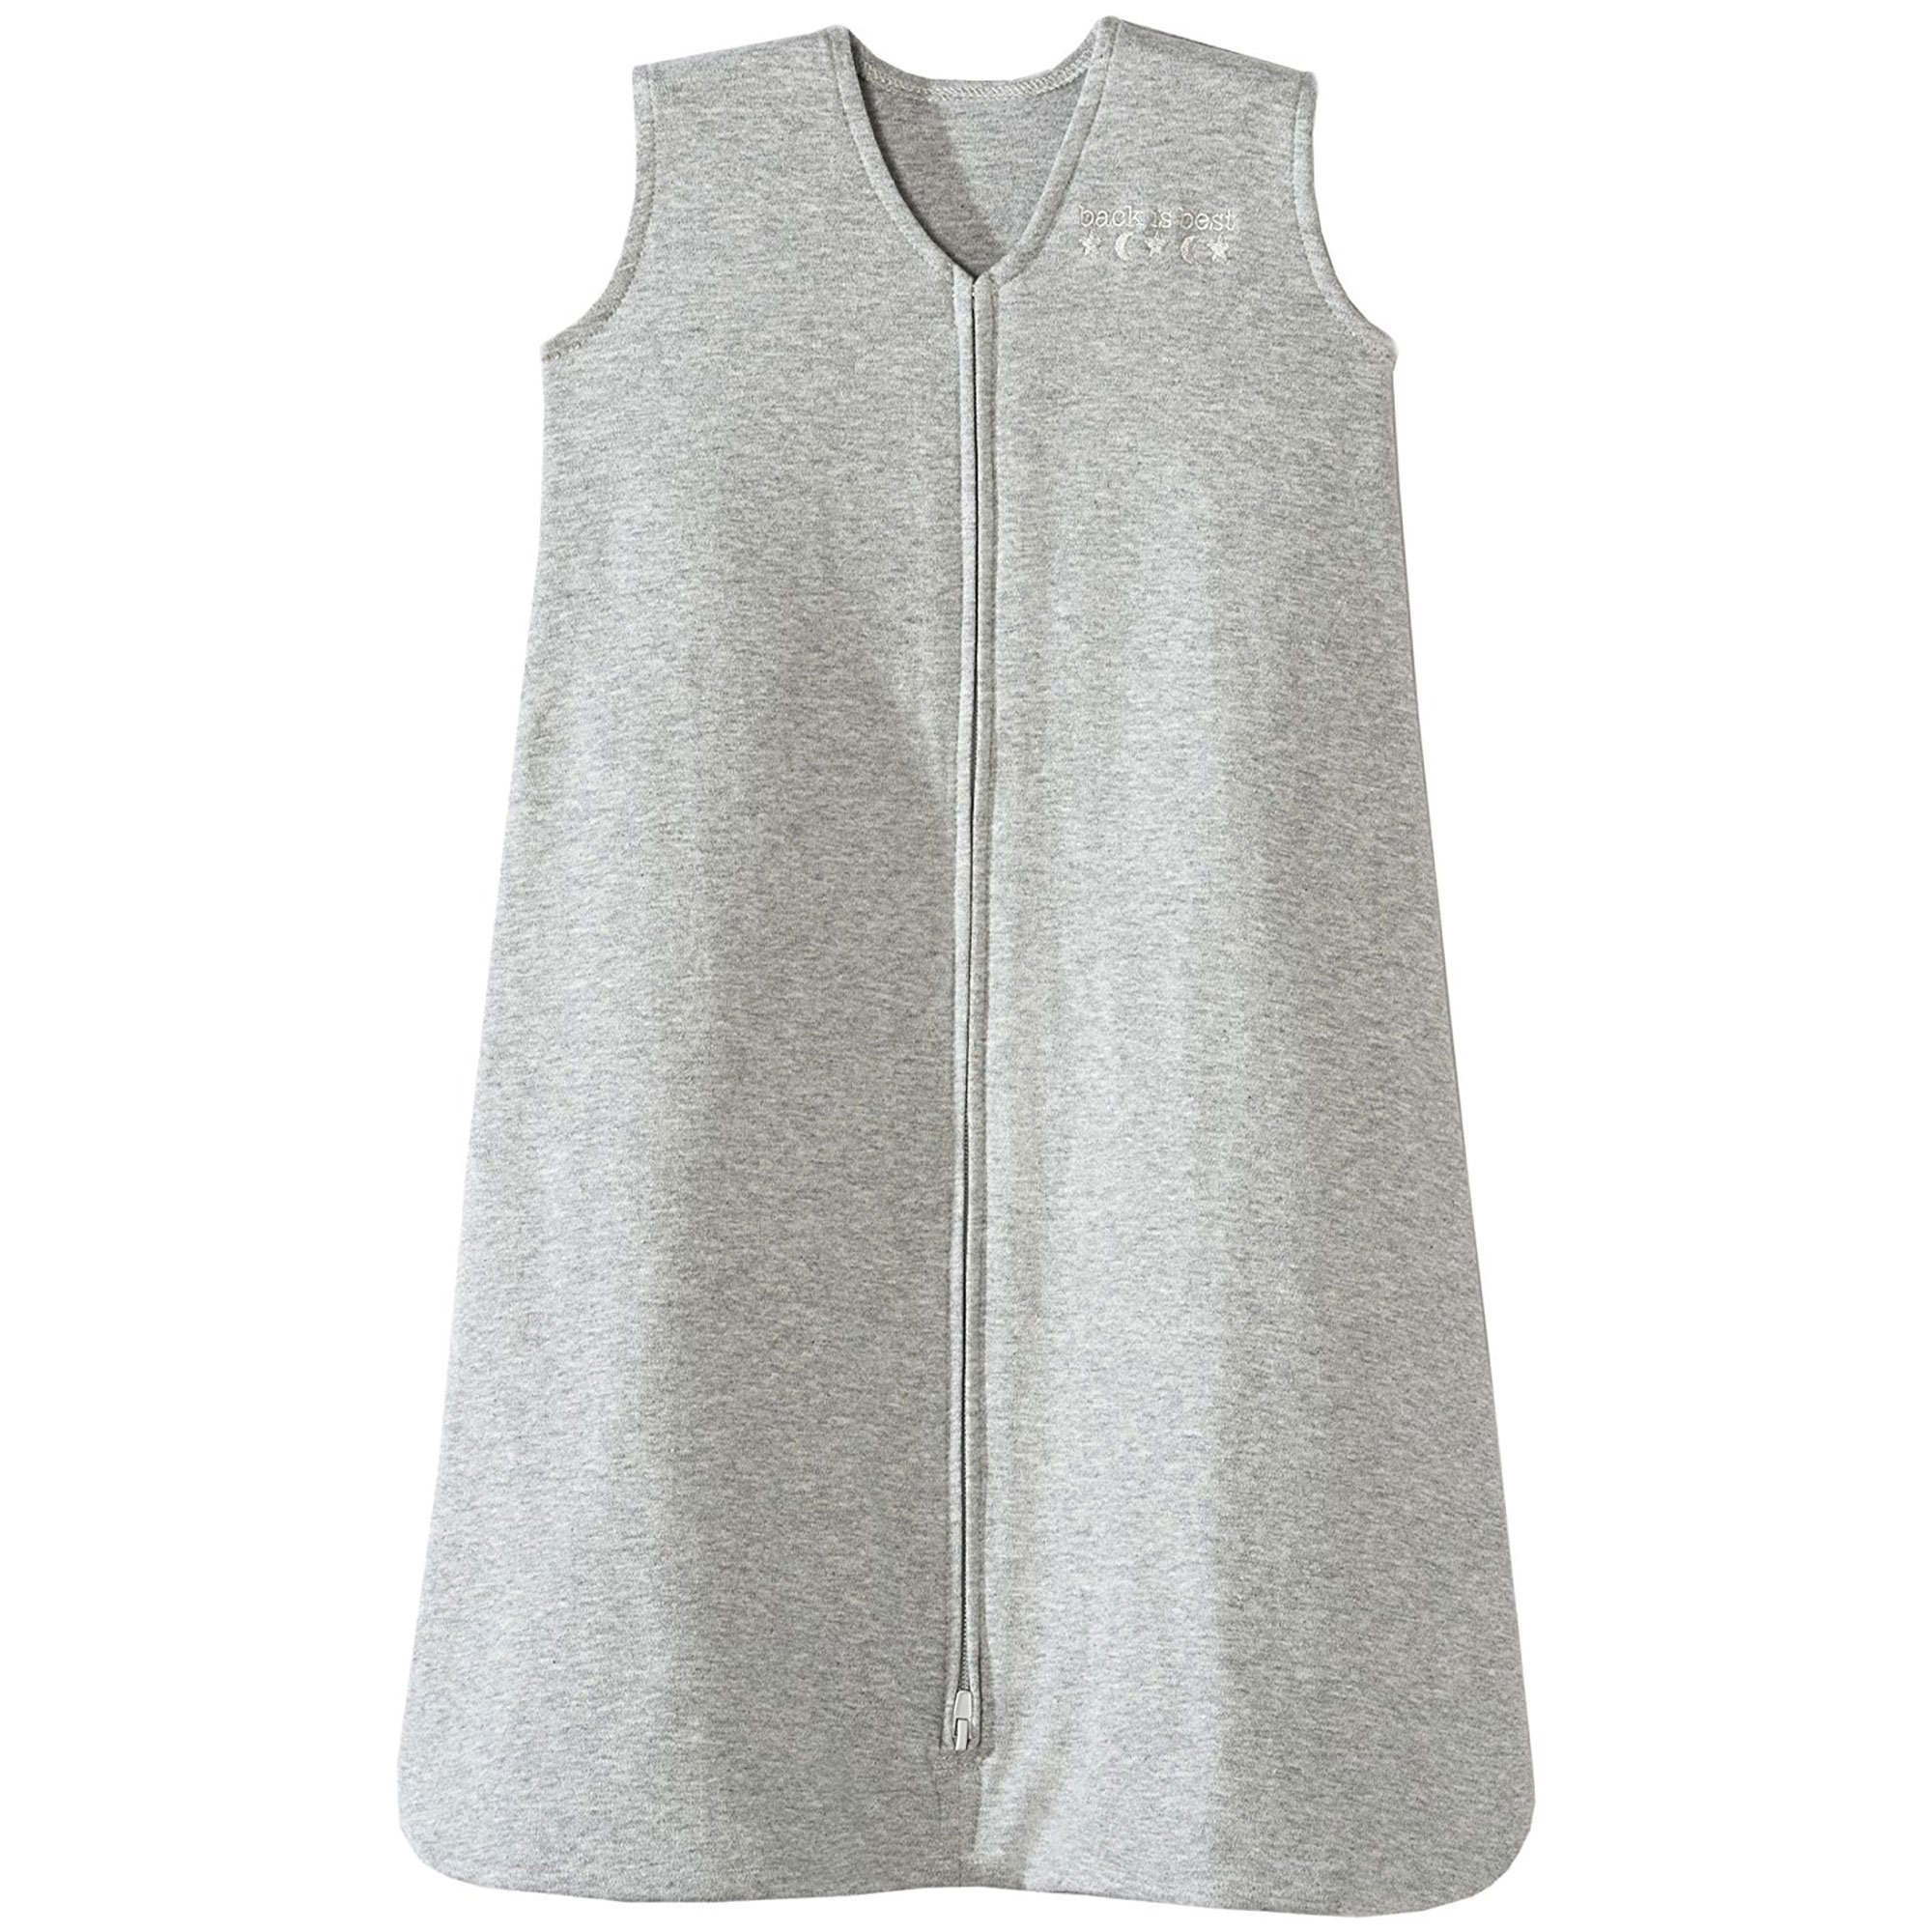 Halo Sleepsack 100% Cotton Wearable Blanket, Heather Gray, X-Large by Halo